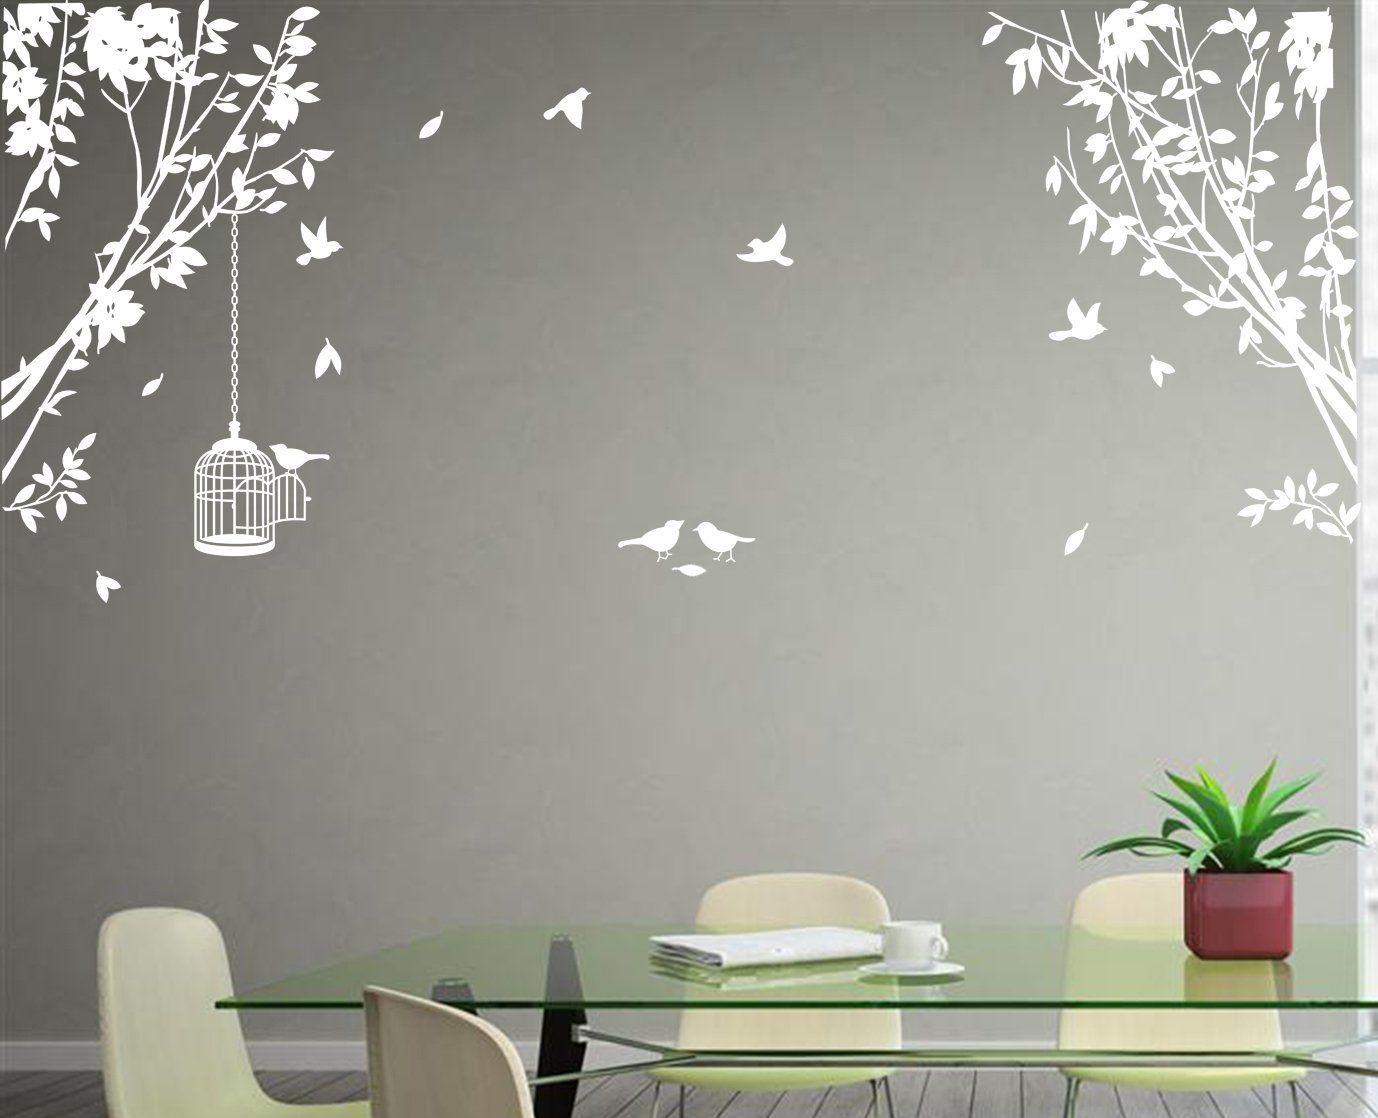 Large Side Wall Tree Branch Birds Art Vinyl Wall Transfer Sticker